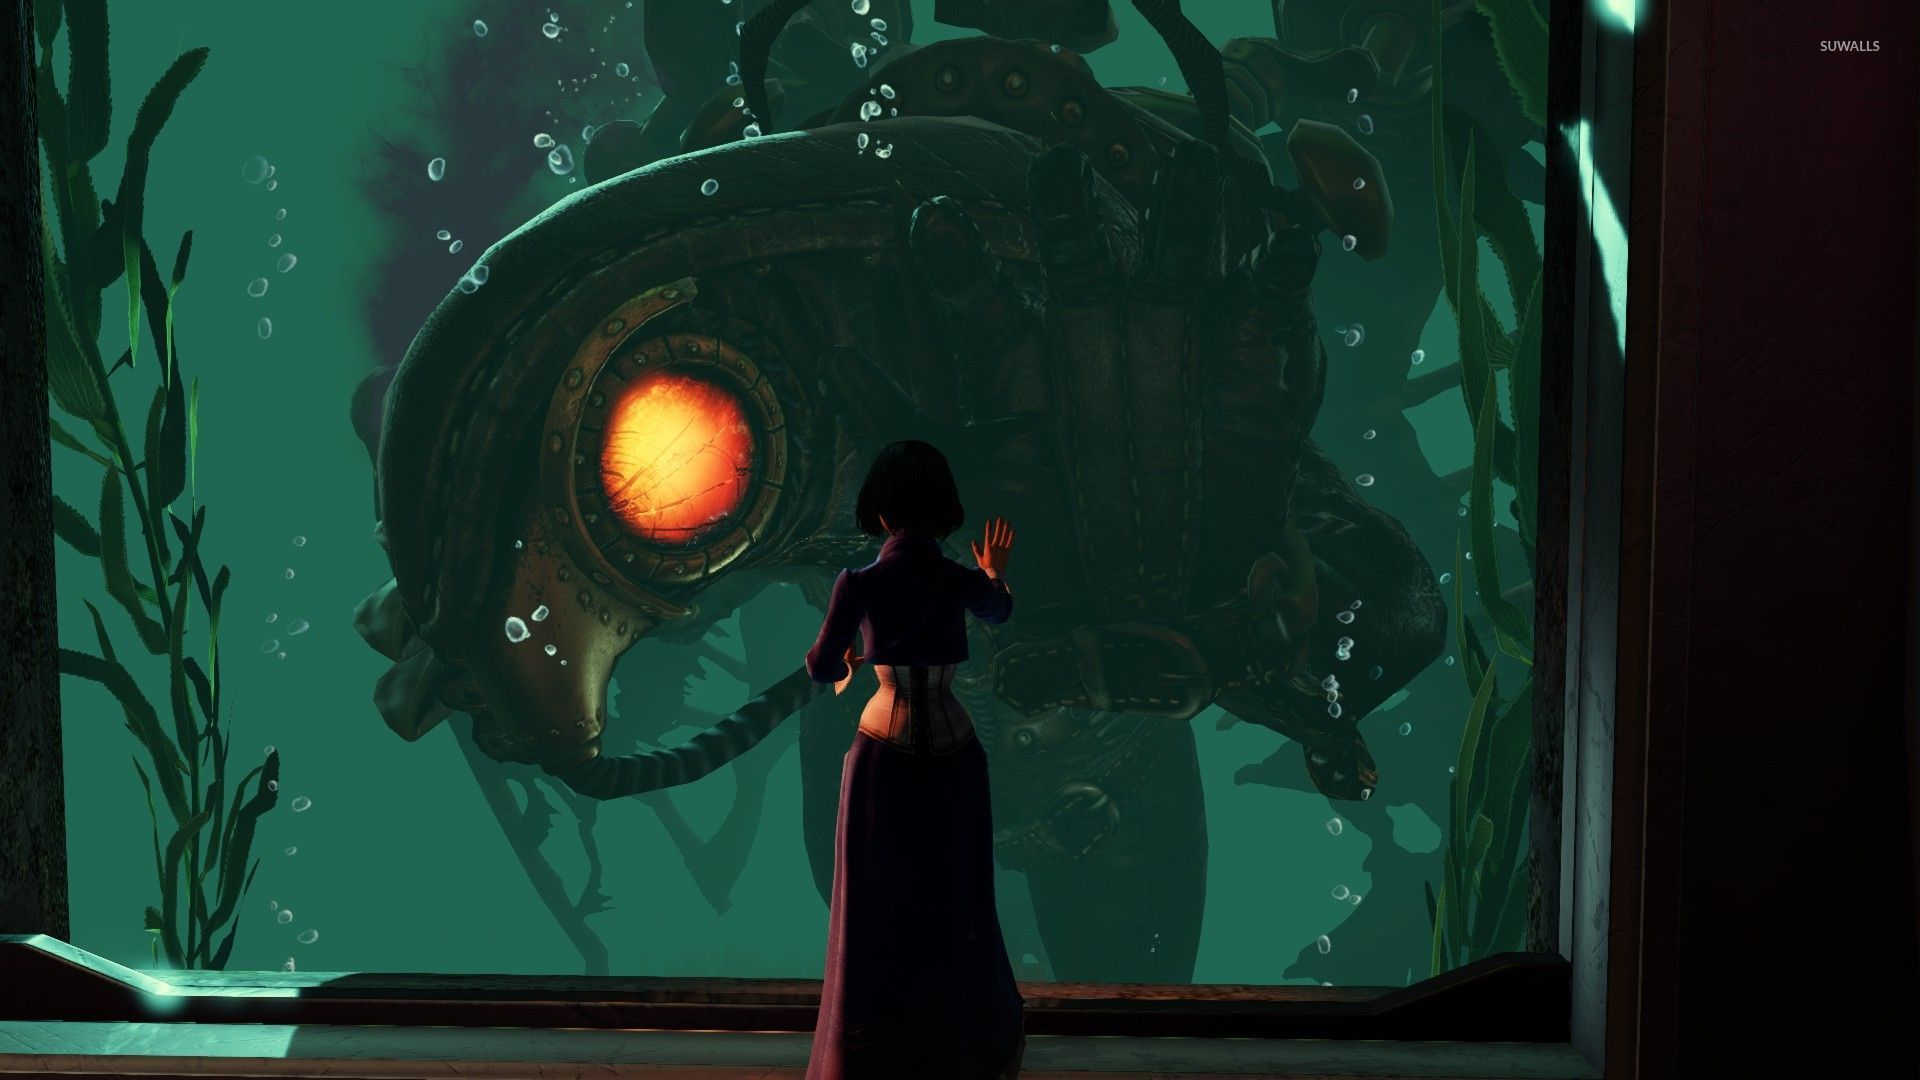 Elizabeth and Songbird - BioShock Infinite wallpaper